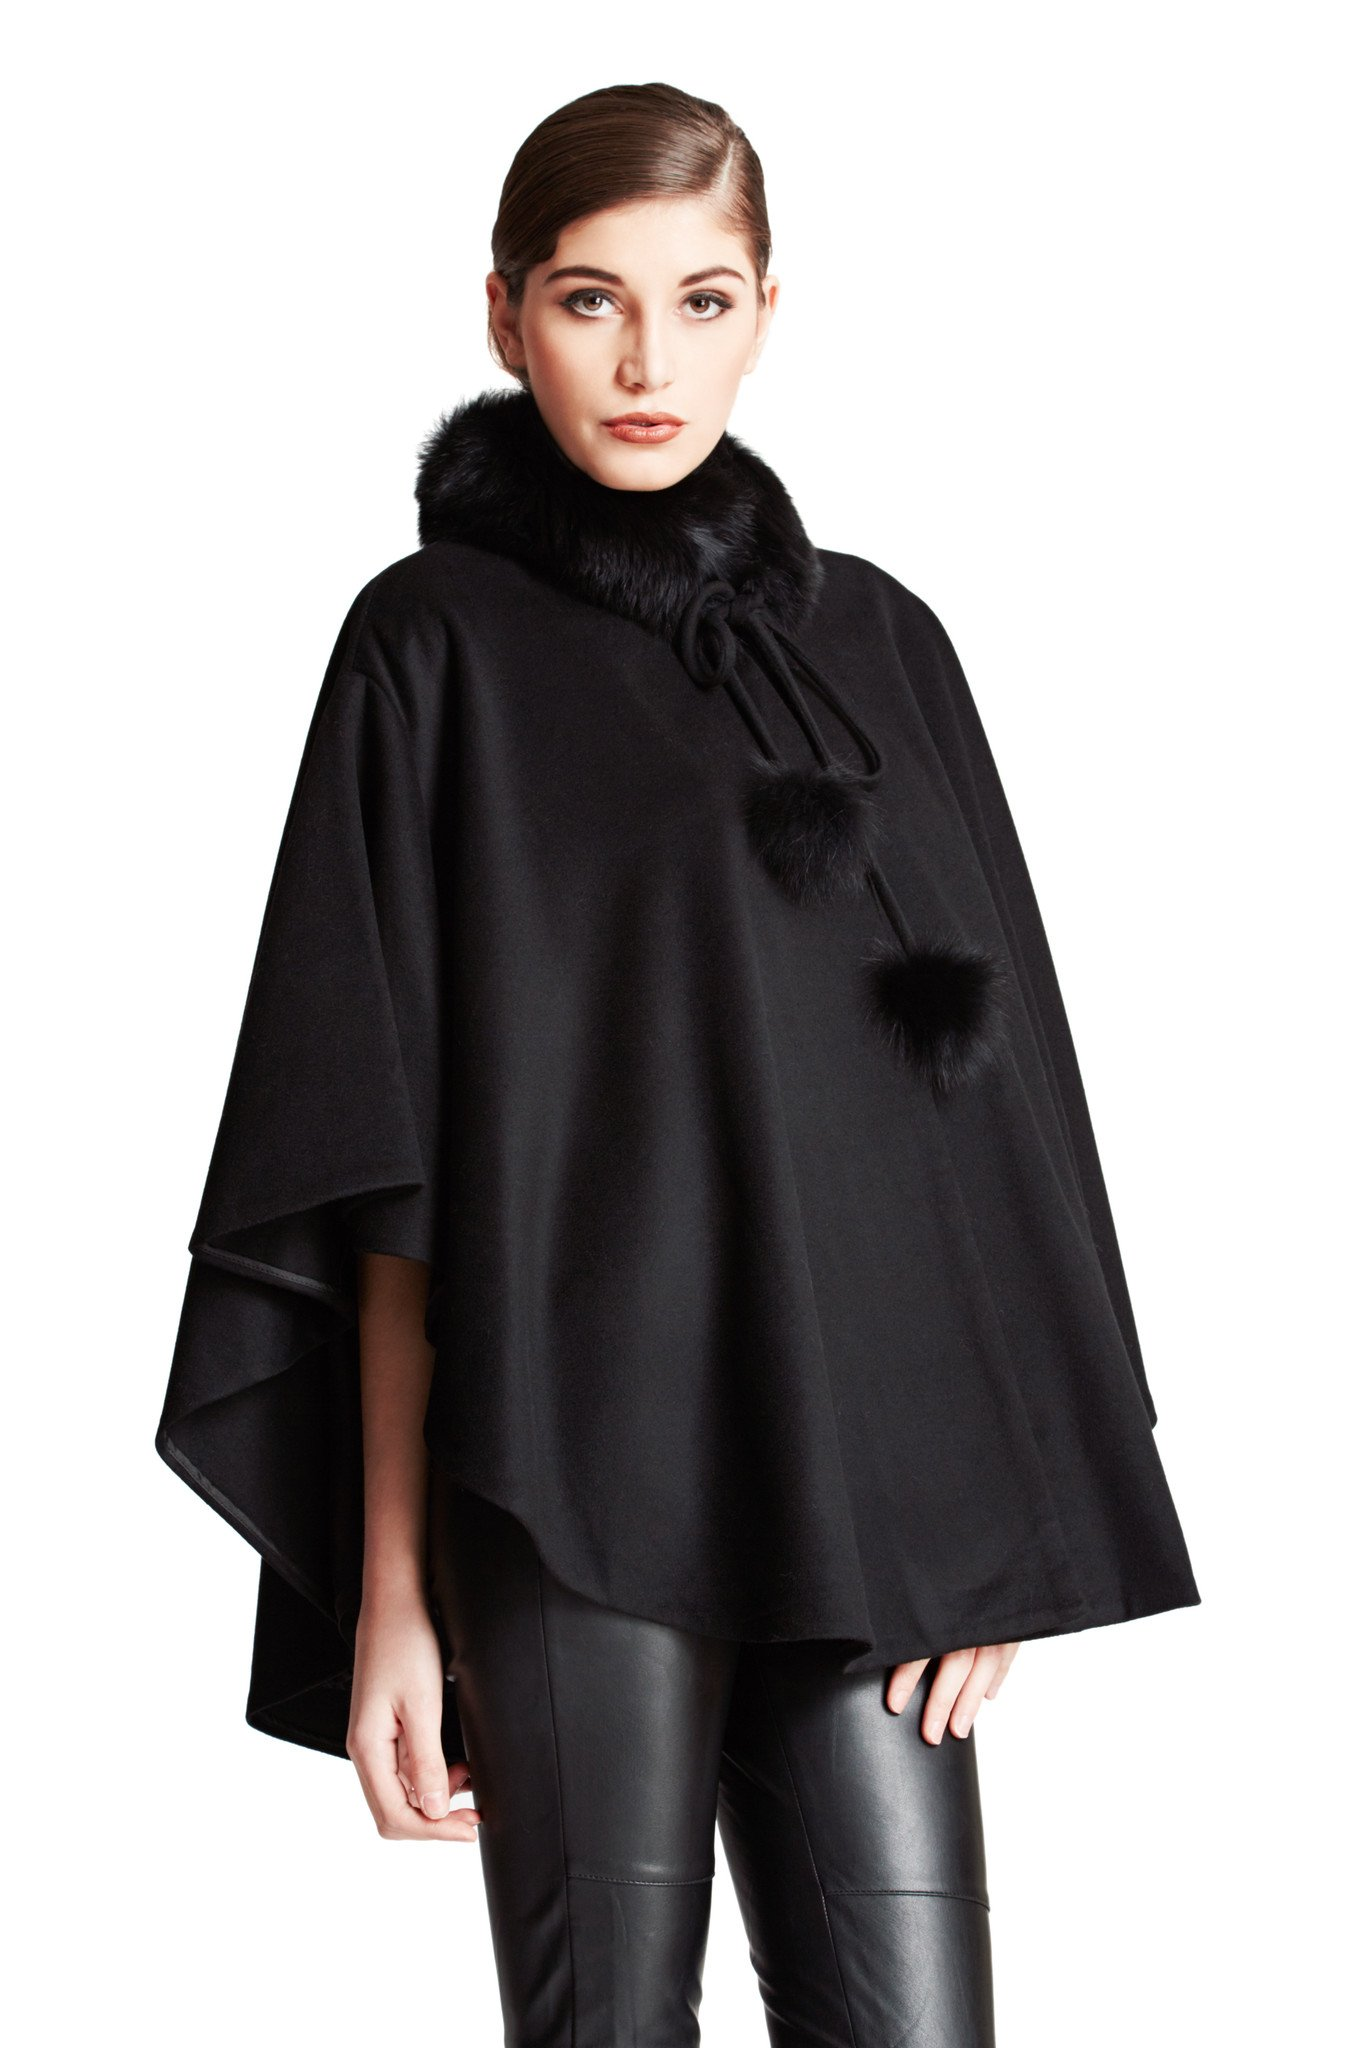 Cashmere Pashmina Group:Cashmere Cape w/genuine Fox Fur Collar & Fox pompom ties (Black) by Cashmere Pashmina Group